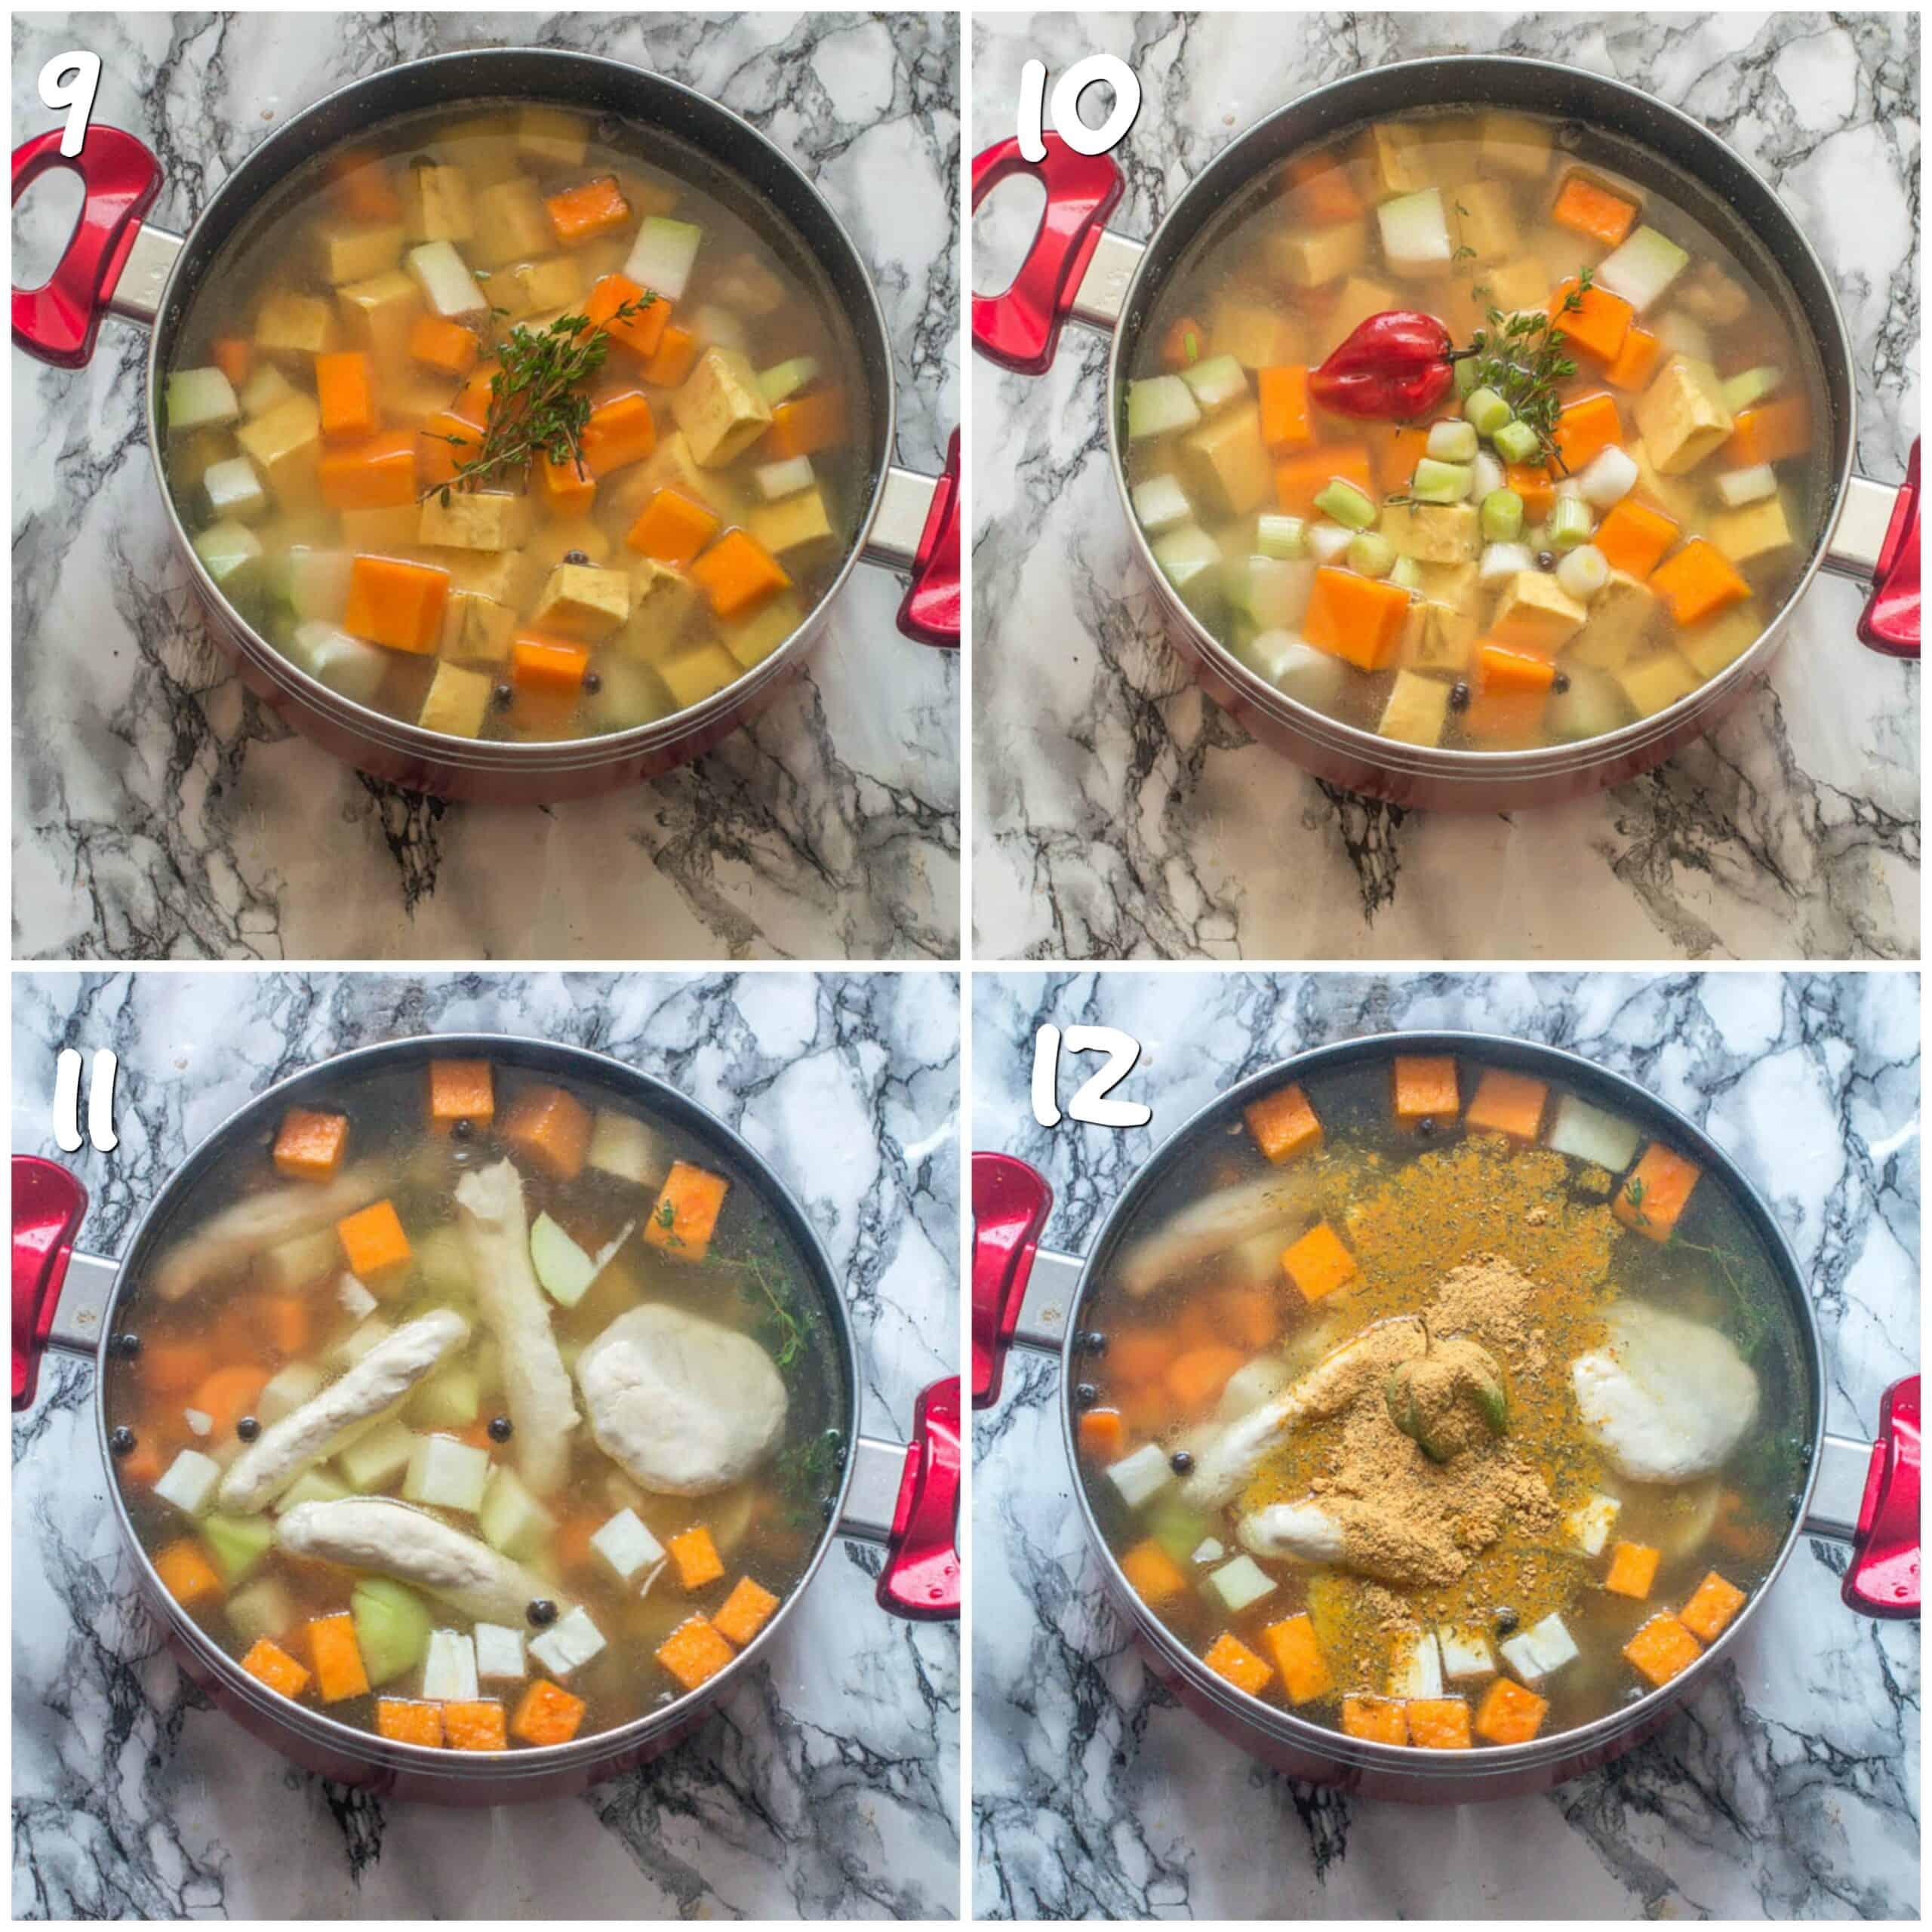 steps 9-12 adding vegetables, dumpling and cock mix